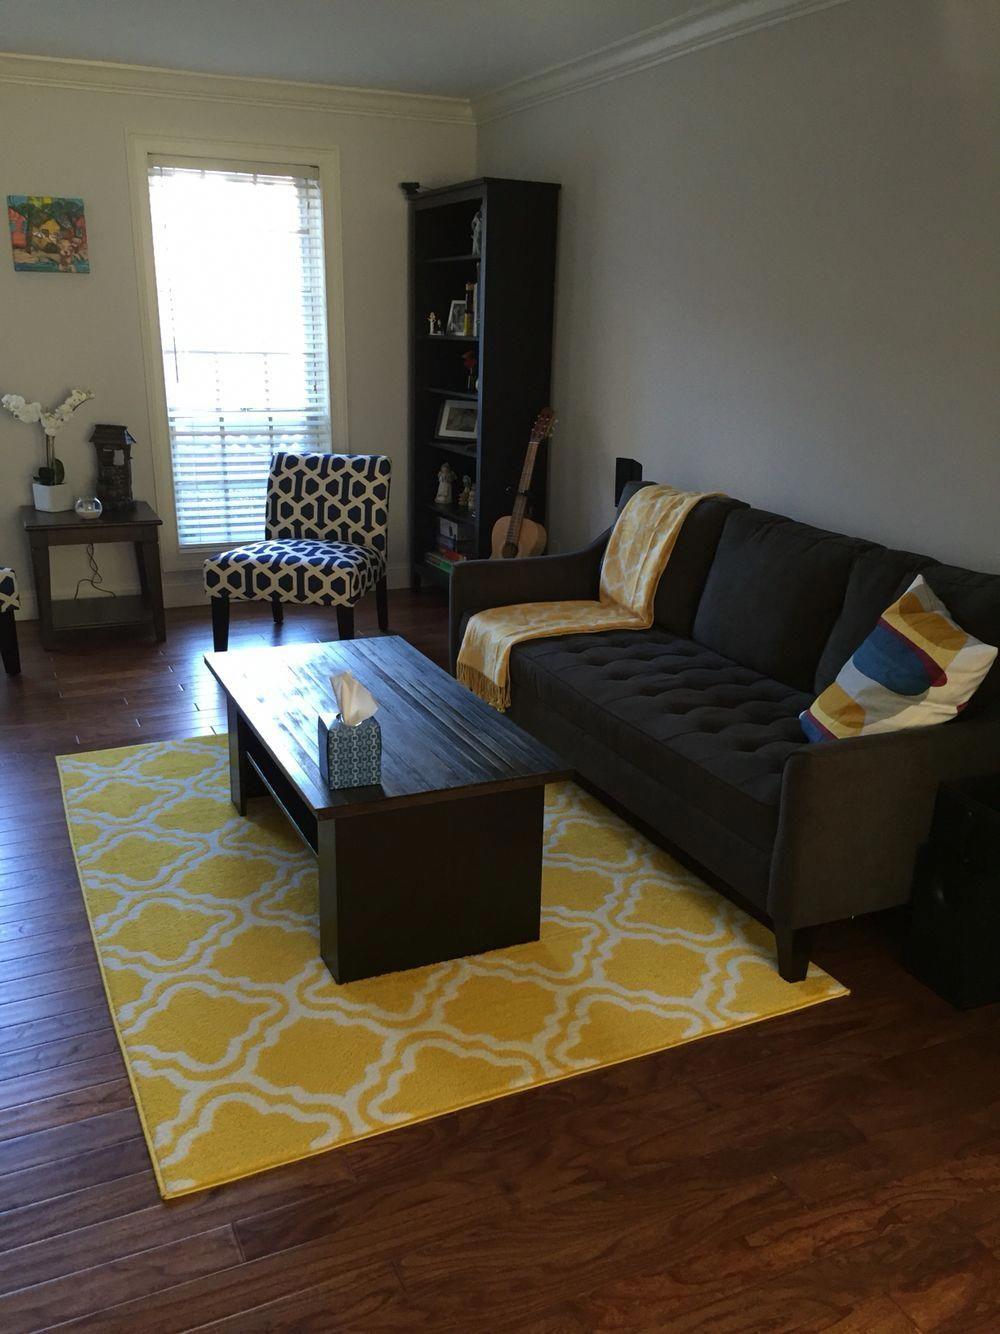 Living Room Yellow And Gray Livingroomdesigns Yellow Living Room Furniture Grey And Yellow Living Room Living Room Decor Gray #yellow #living #room #decor #ideas